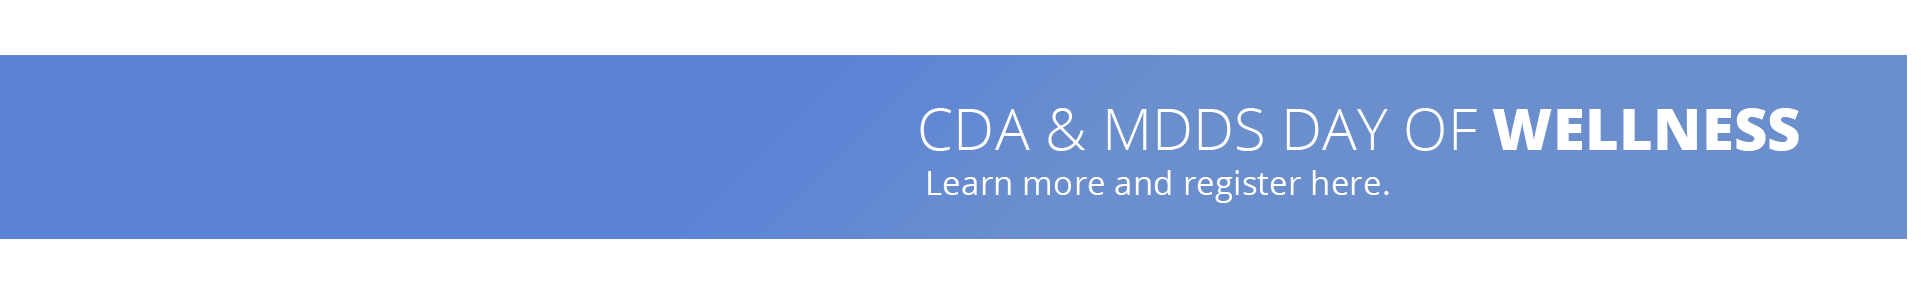 CDA & MDDS Day of Wellness